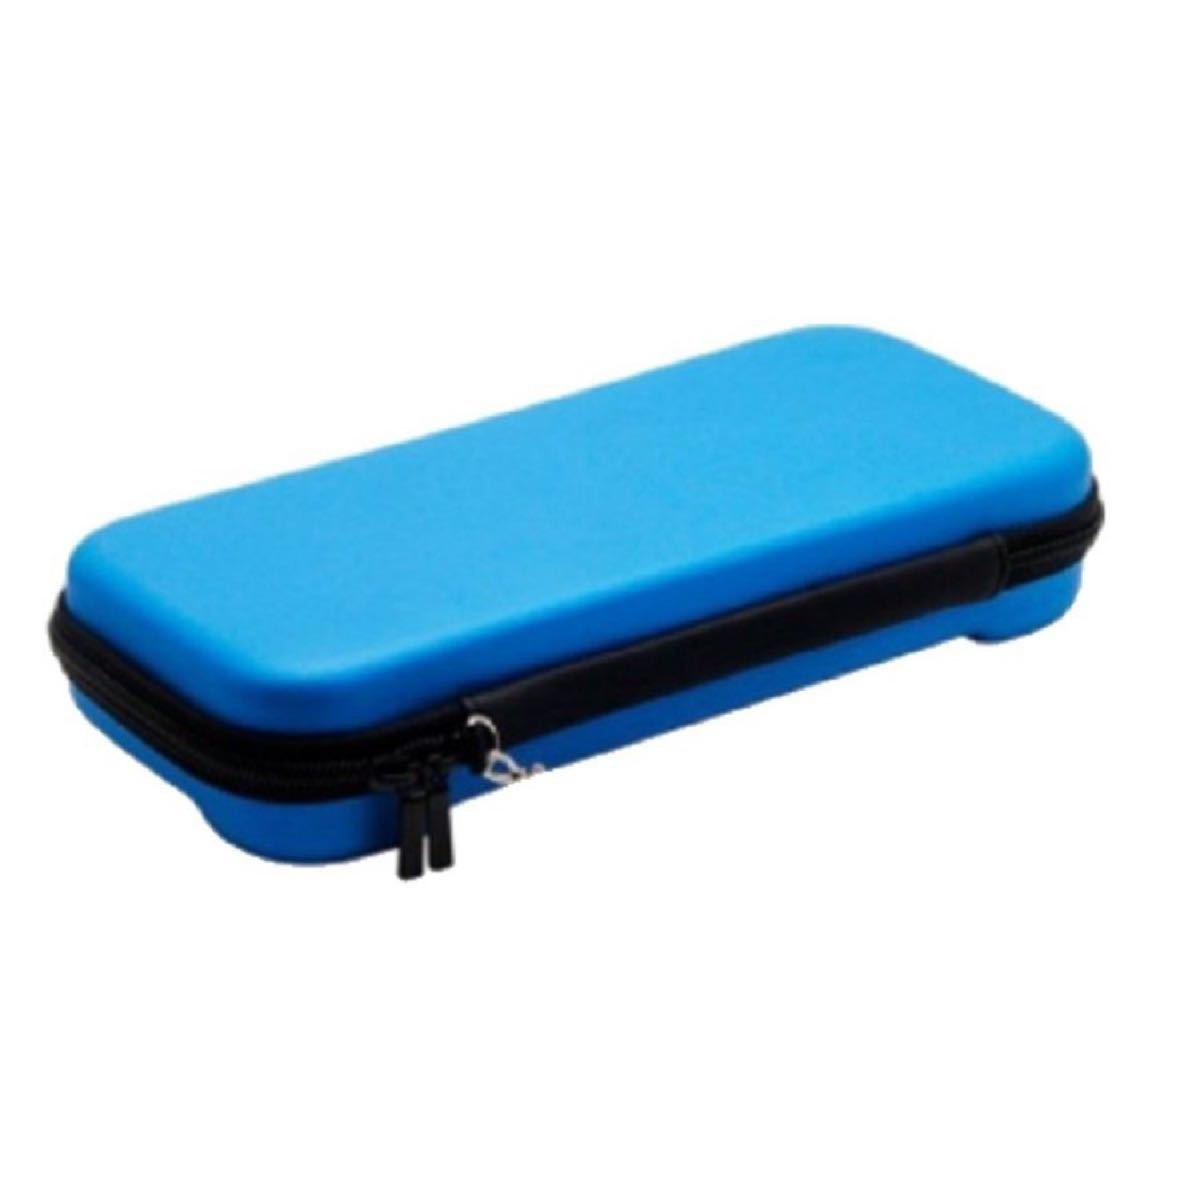 Nintendo Switch 任天堂スイッチ 収納ケース セミハード Nintendo Switch ケース【ブルー】